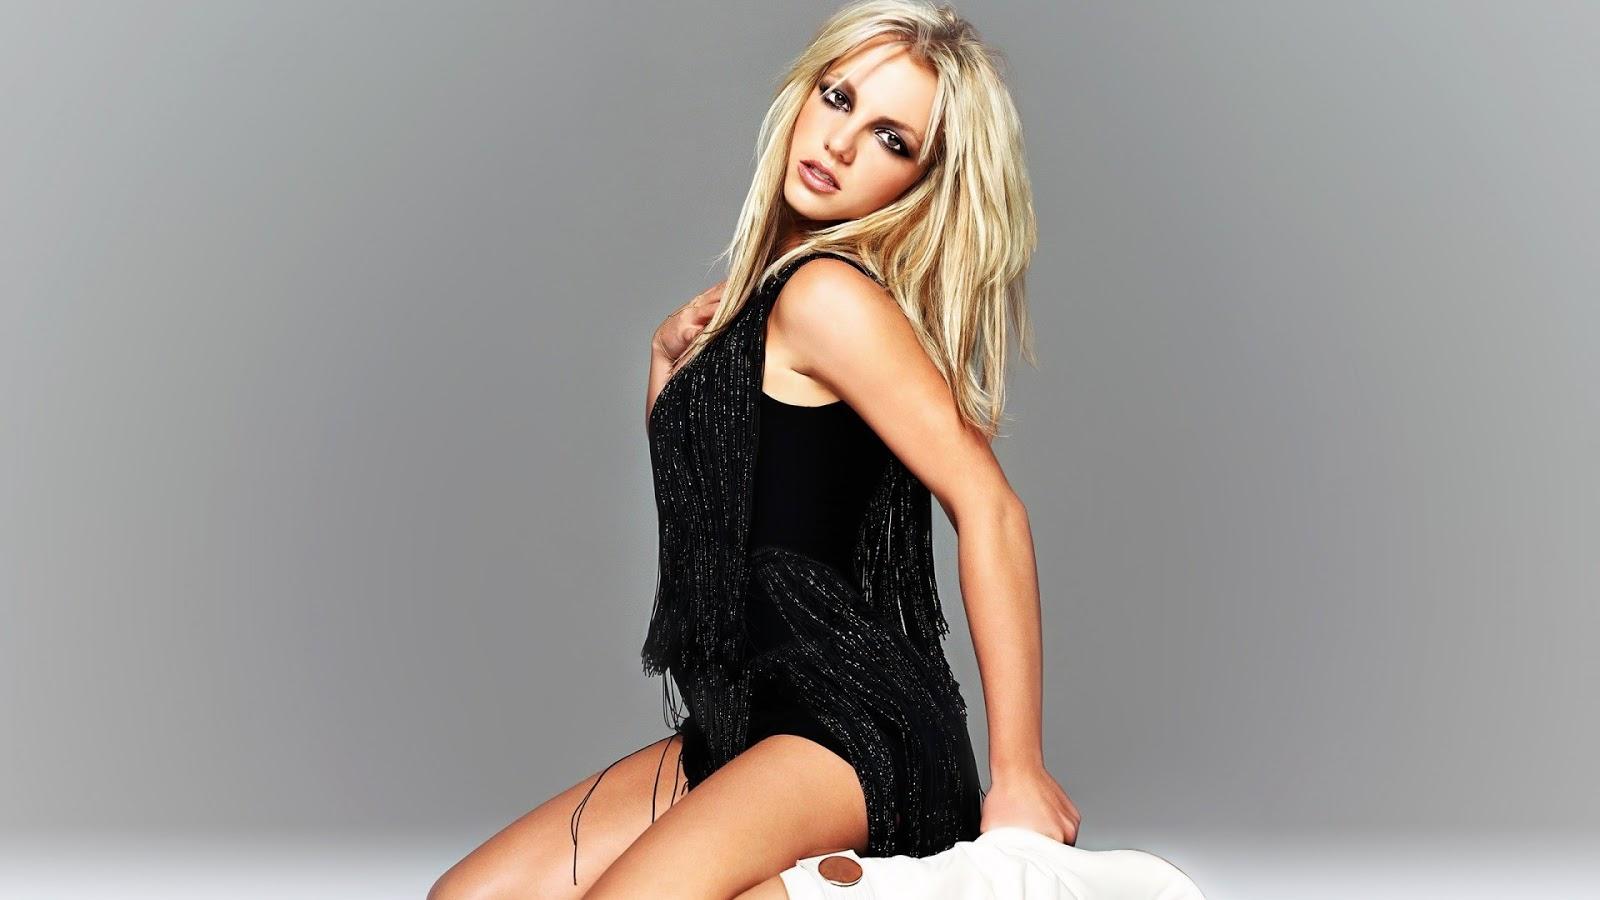 Britney Spears in Black Fringe Dress